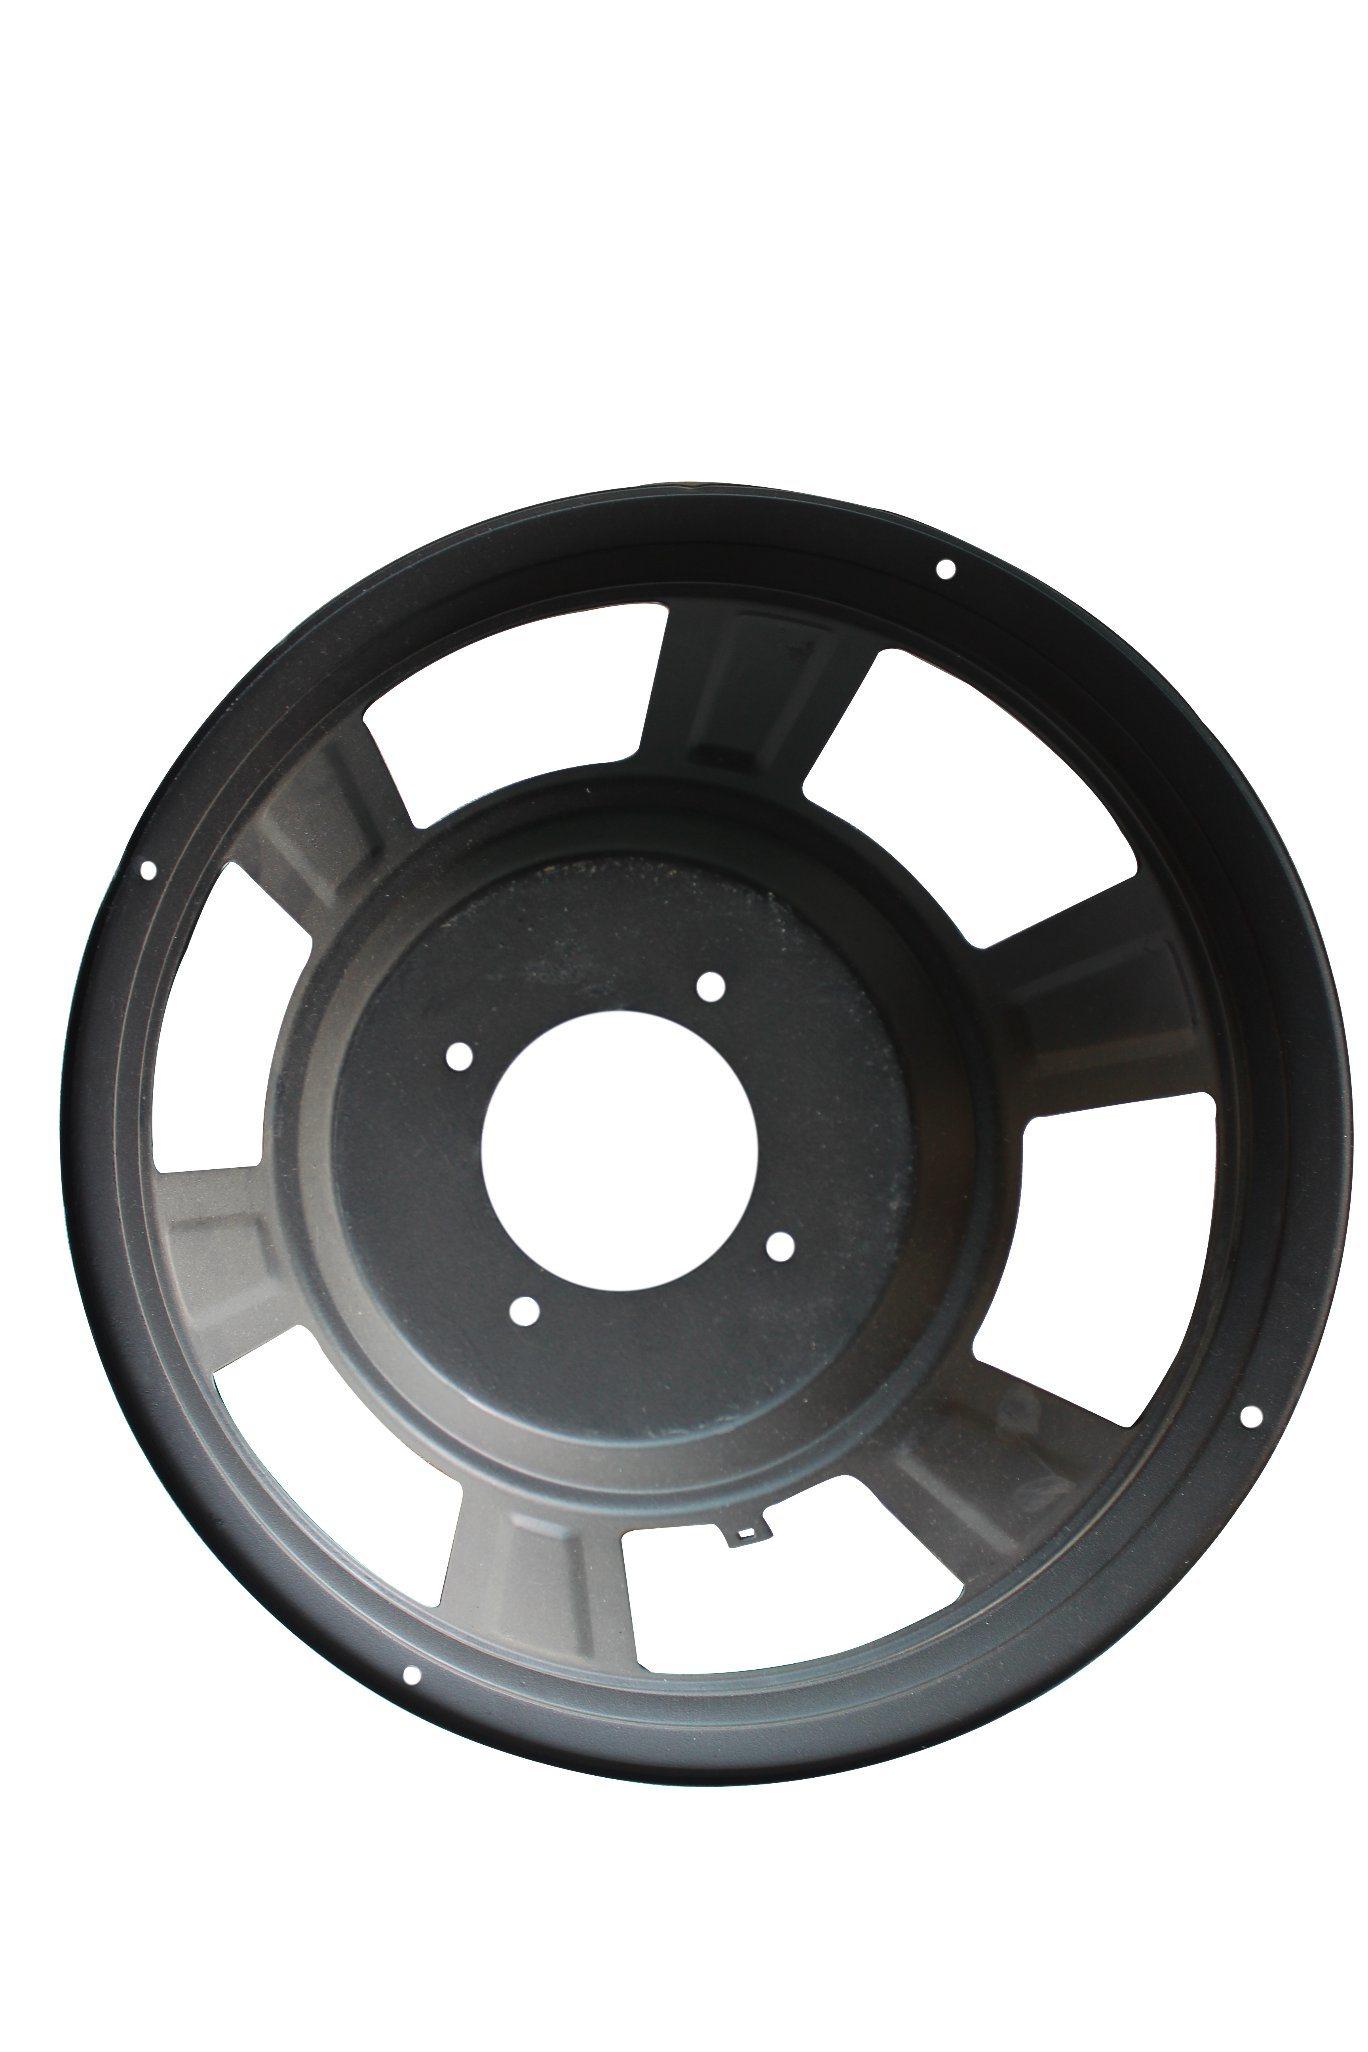 Speaker Basket for Customization Iron Speaker Parts PA Peaker Frame